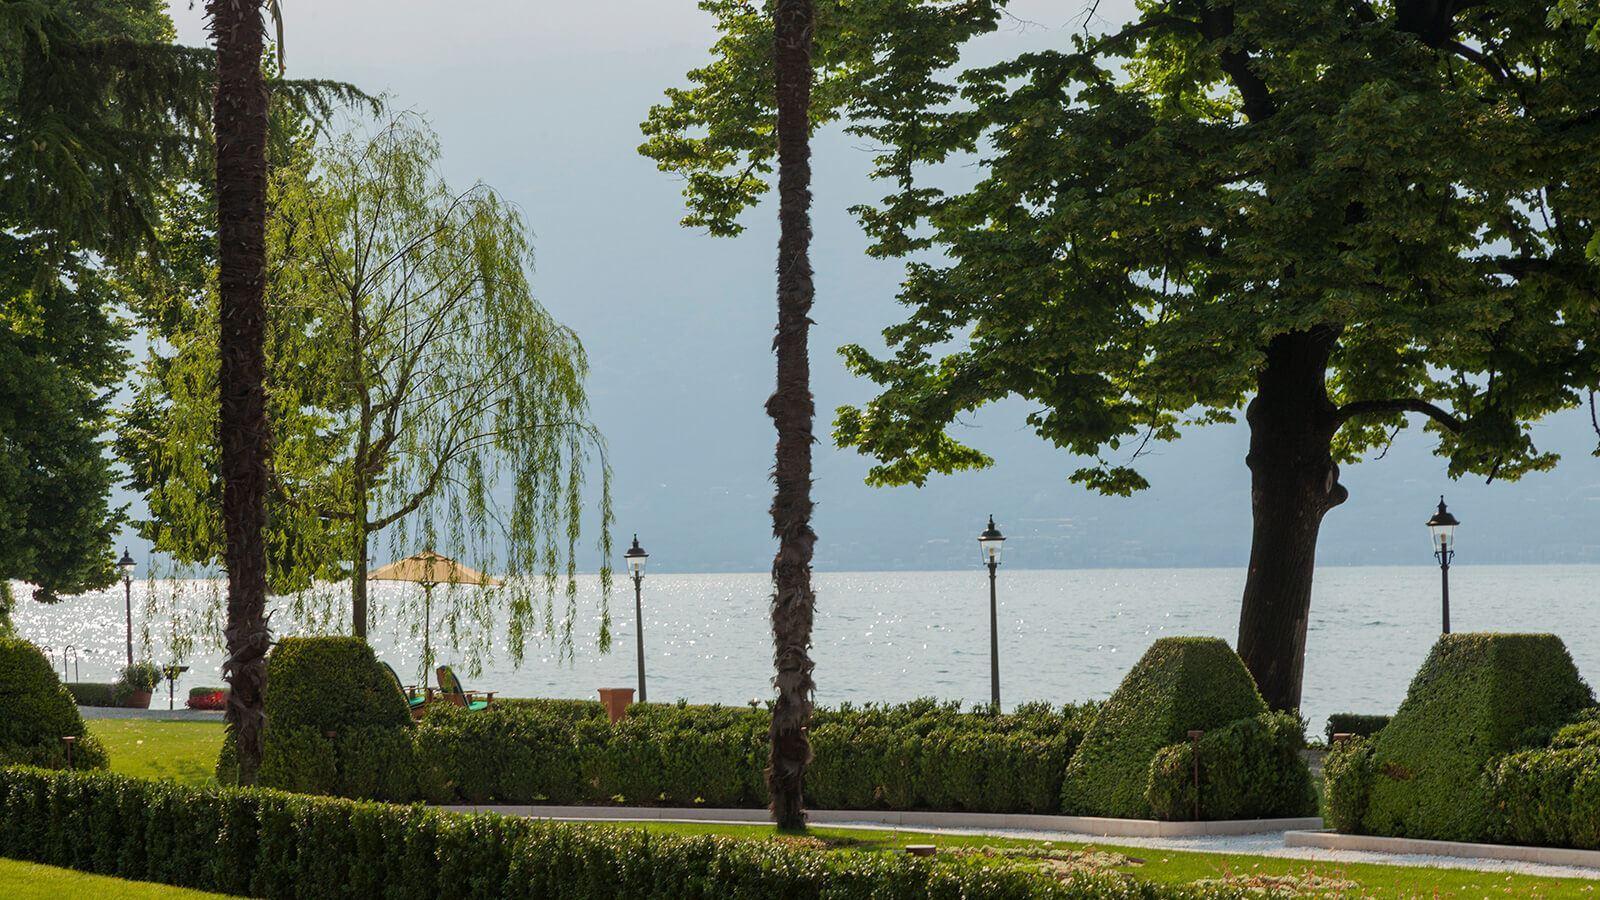 Grand-Hotel-Villa-Feltrinelli-Lake-Garda-03-The-Garden-and-the-lake